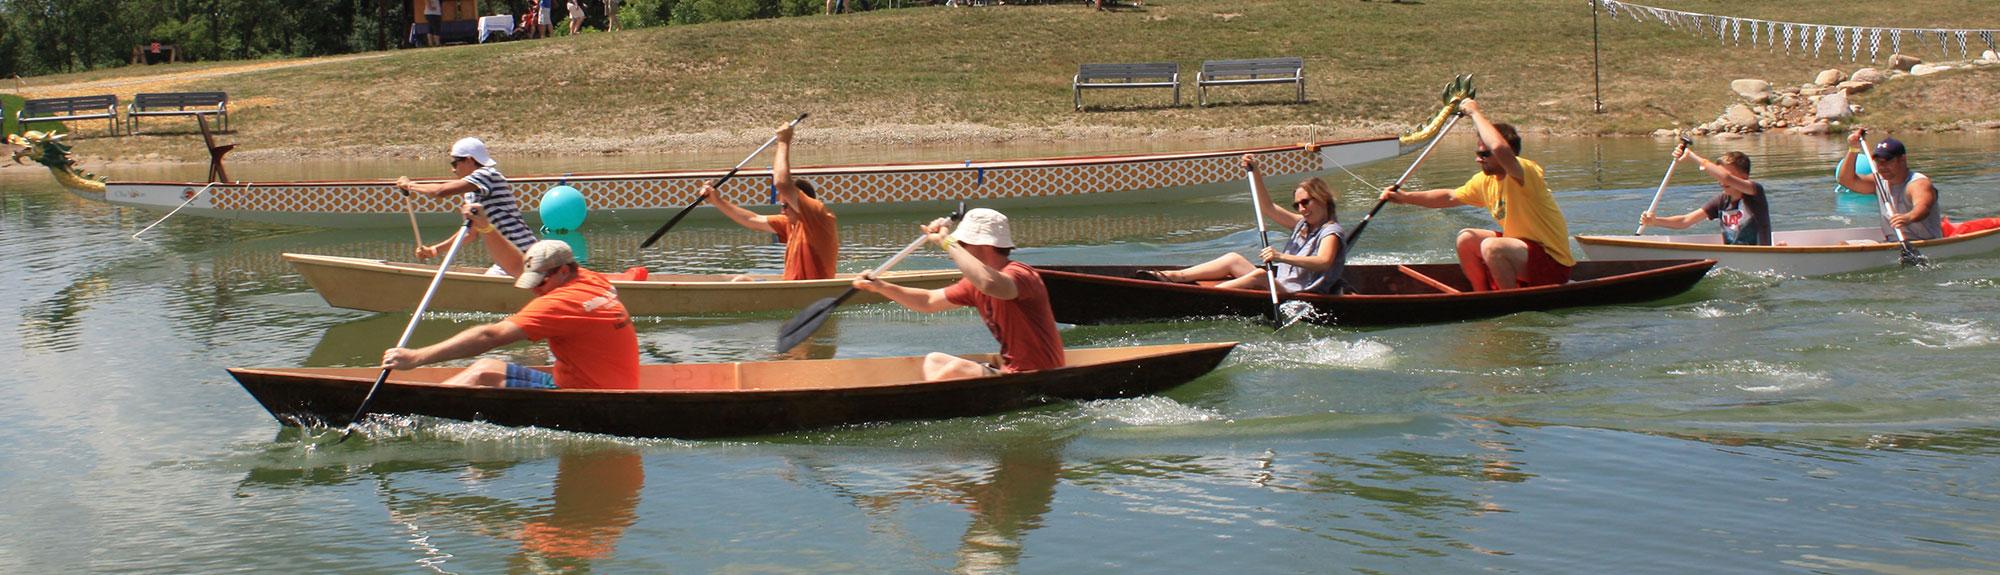 Dragonboat racing at Robin Hills Farm